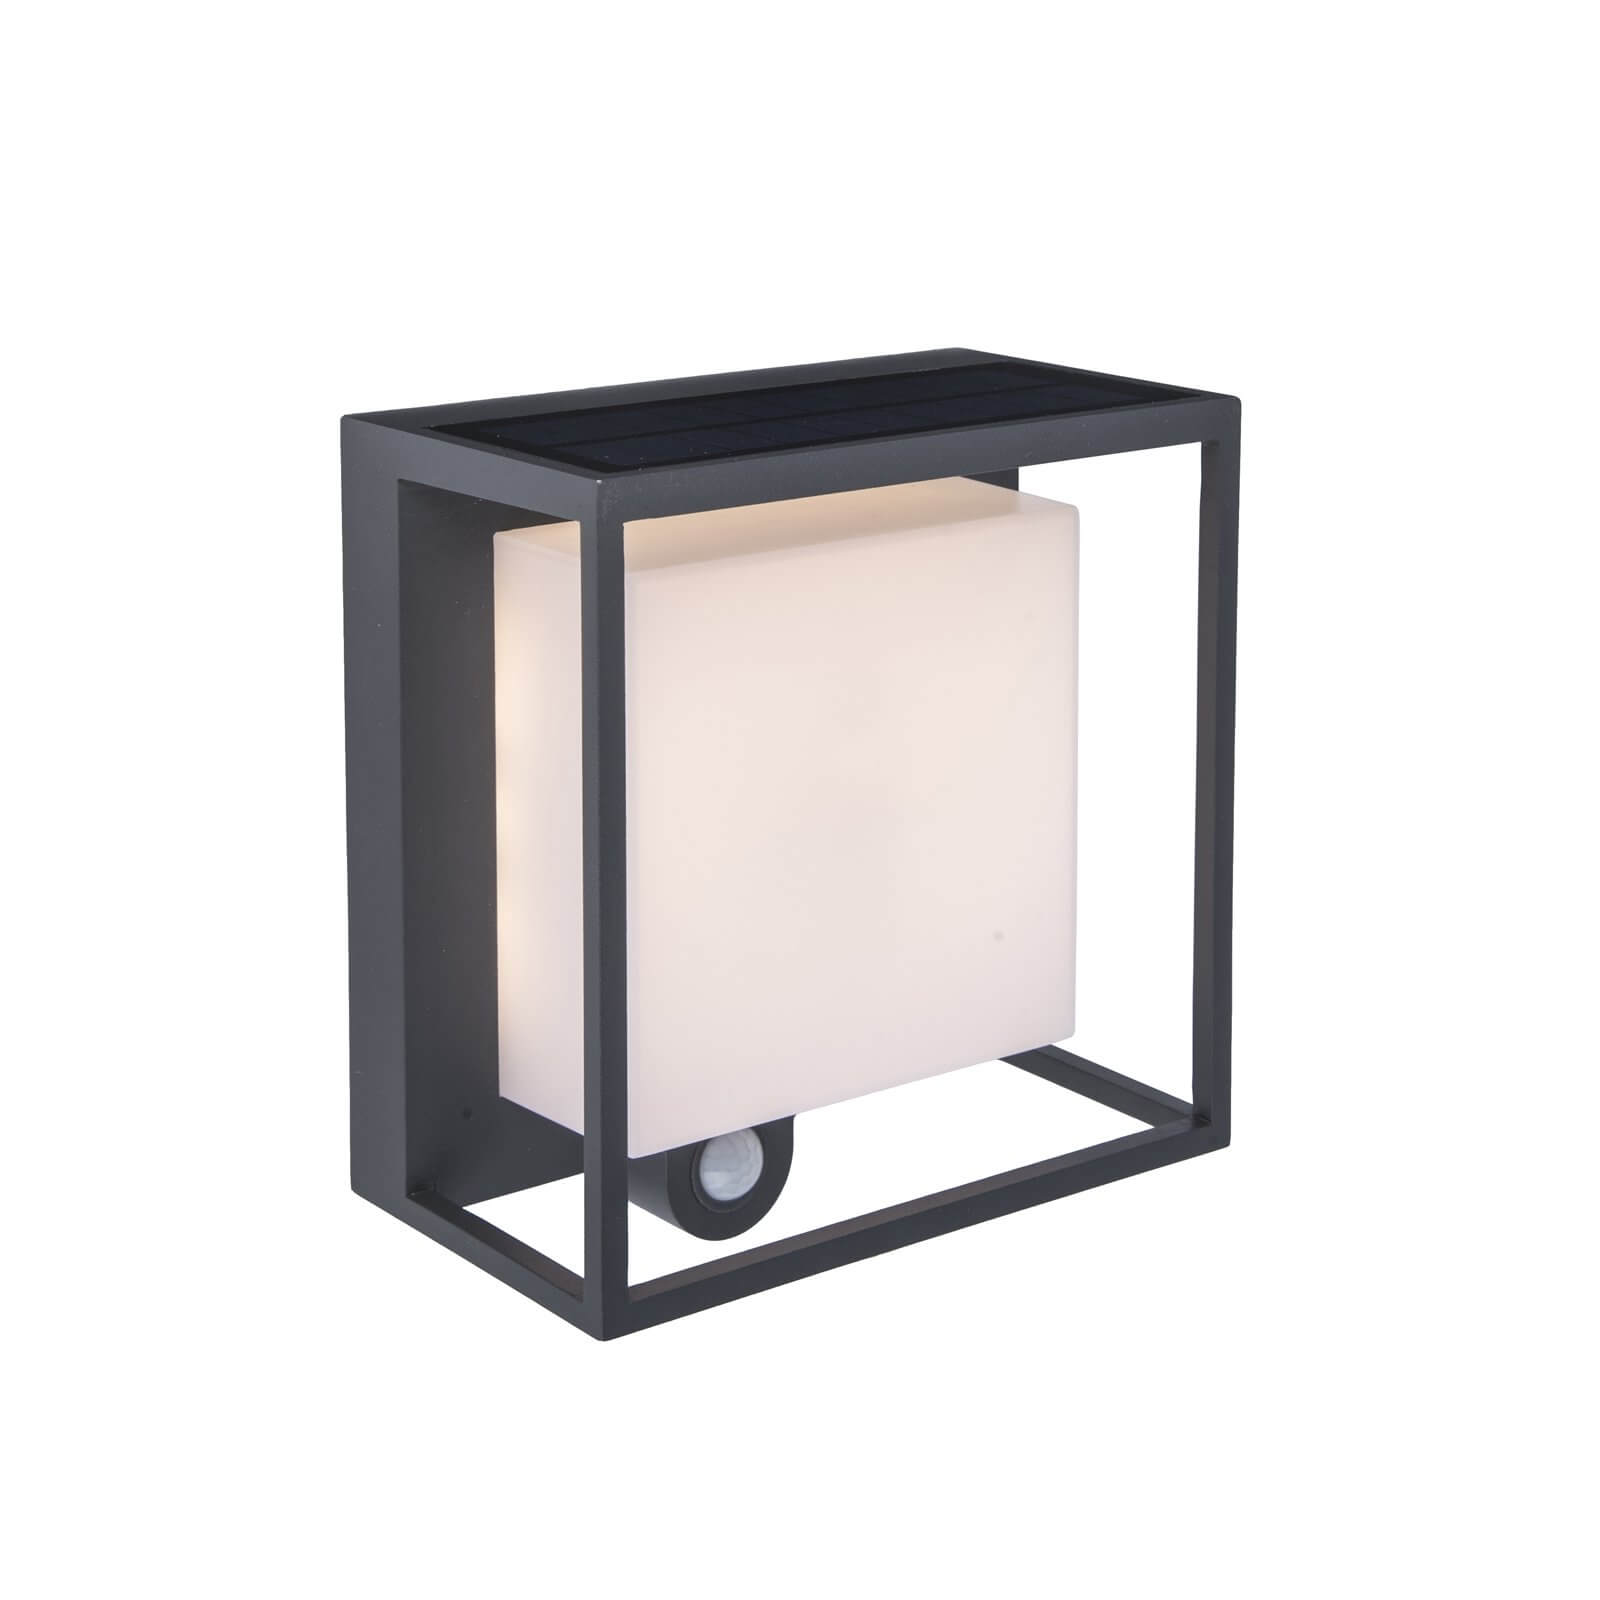 Lutec Curtis Solar LED Outdoor Wall Light With PIR Motion Sensor